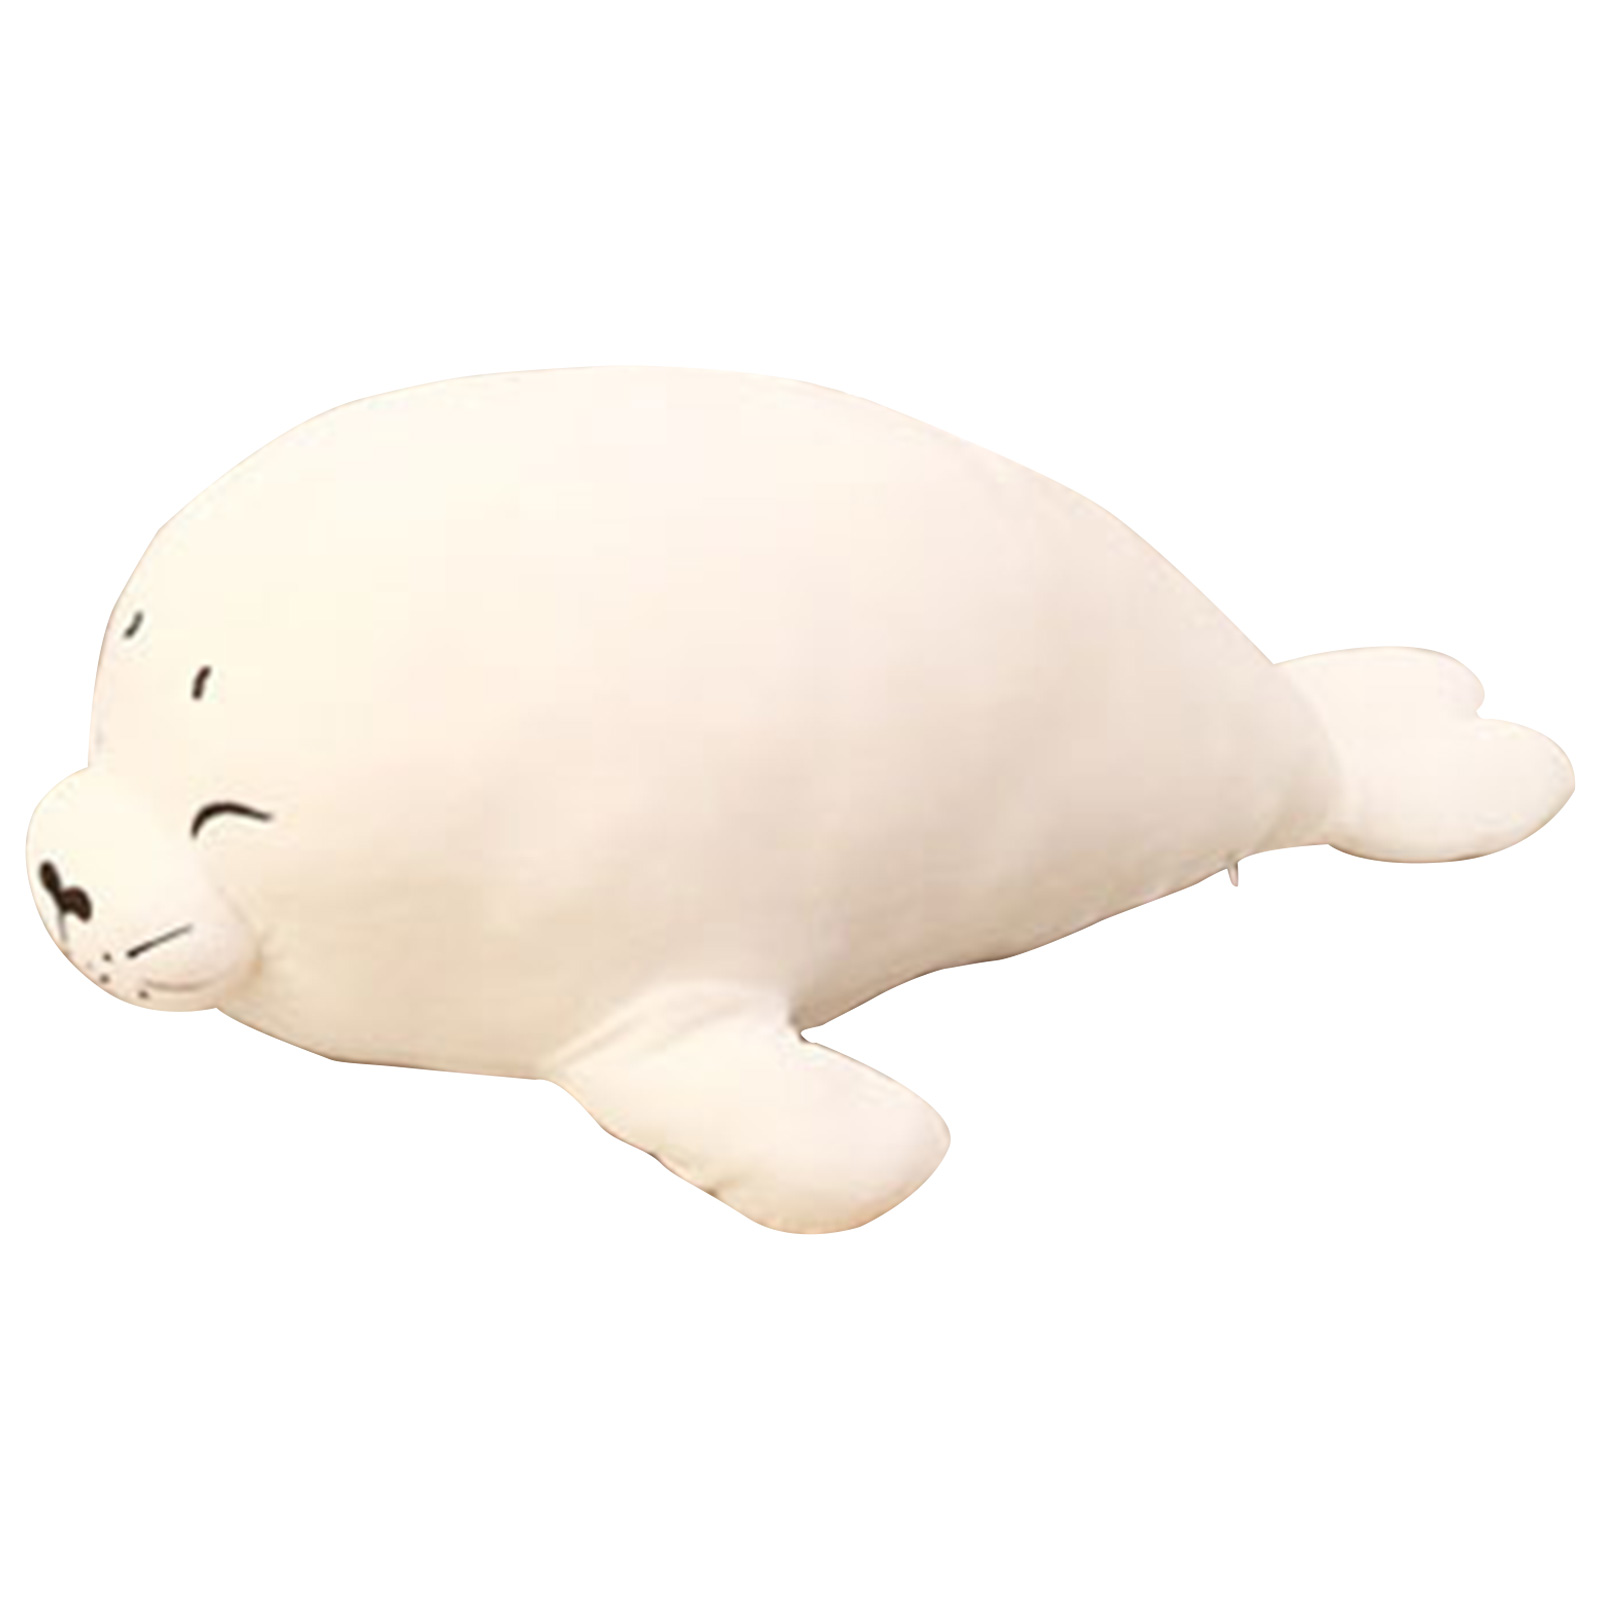 megawheels cute seal plushie soft plush pillow toy stuffed sea animal toys walmart com